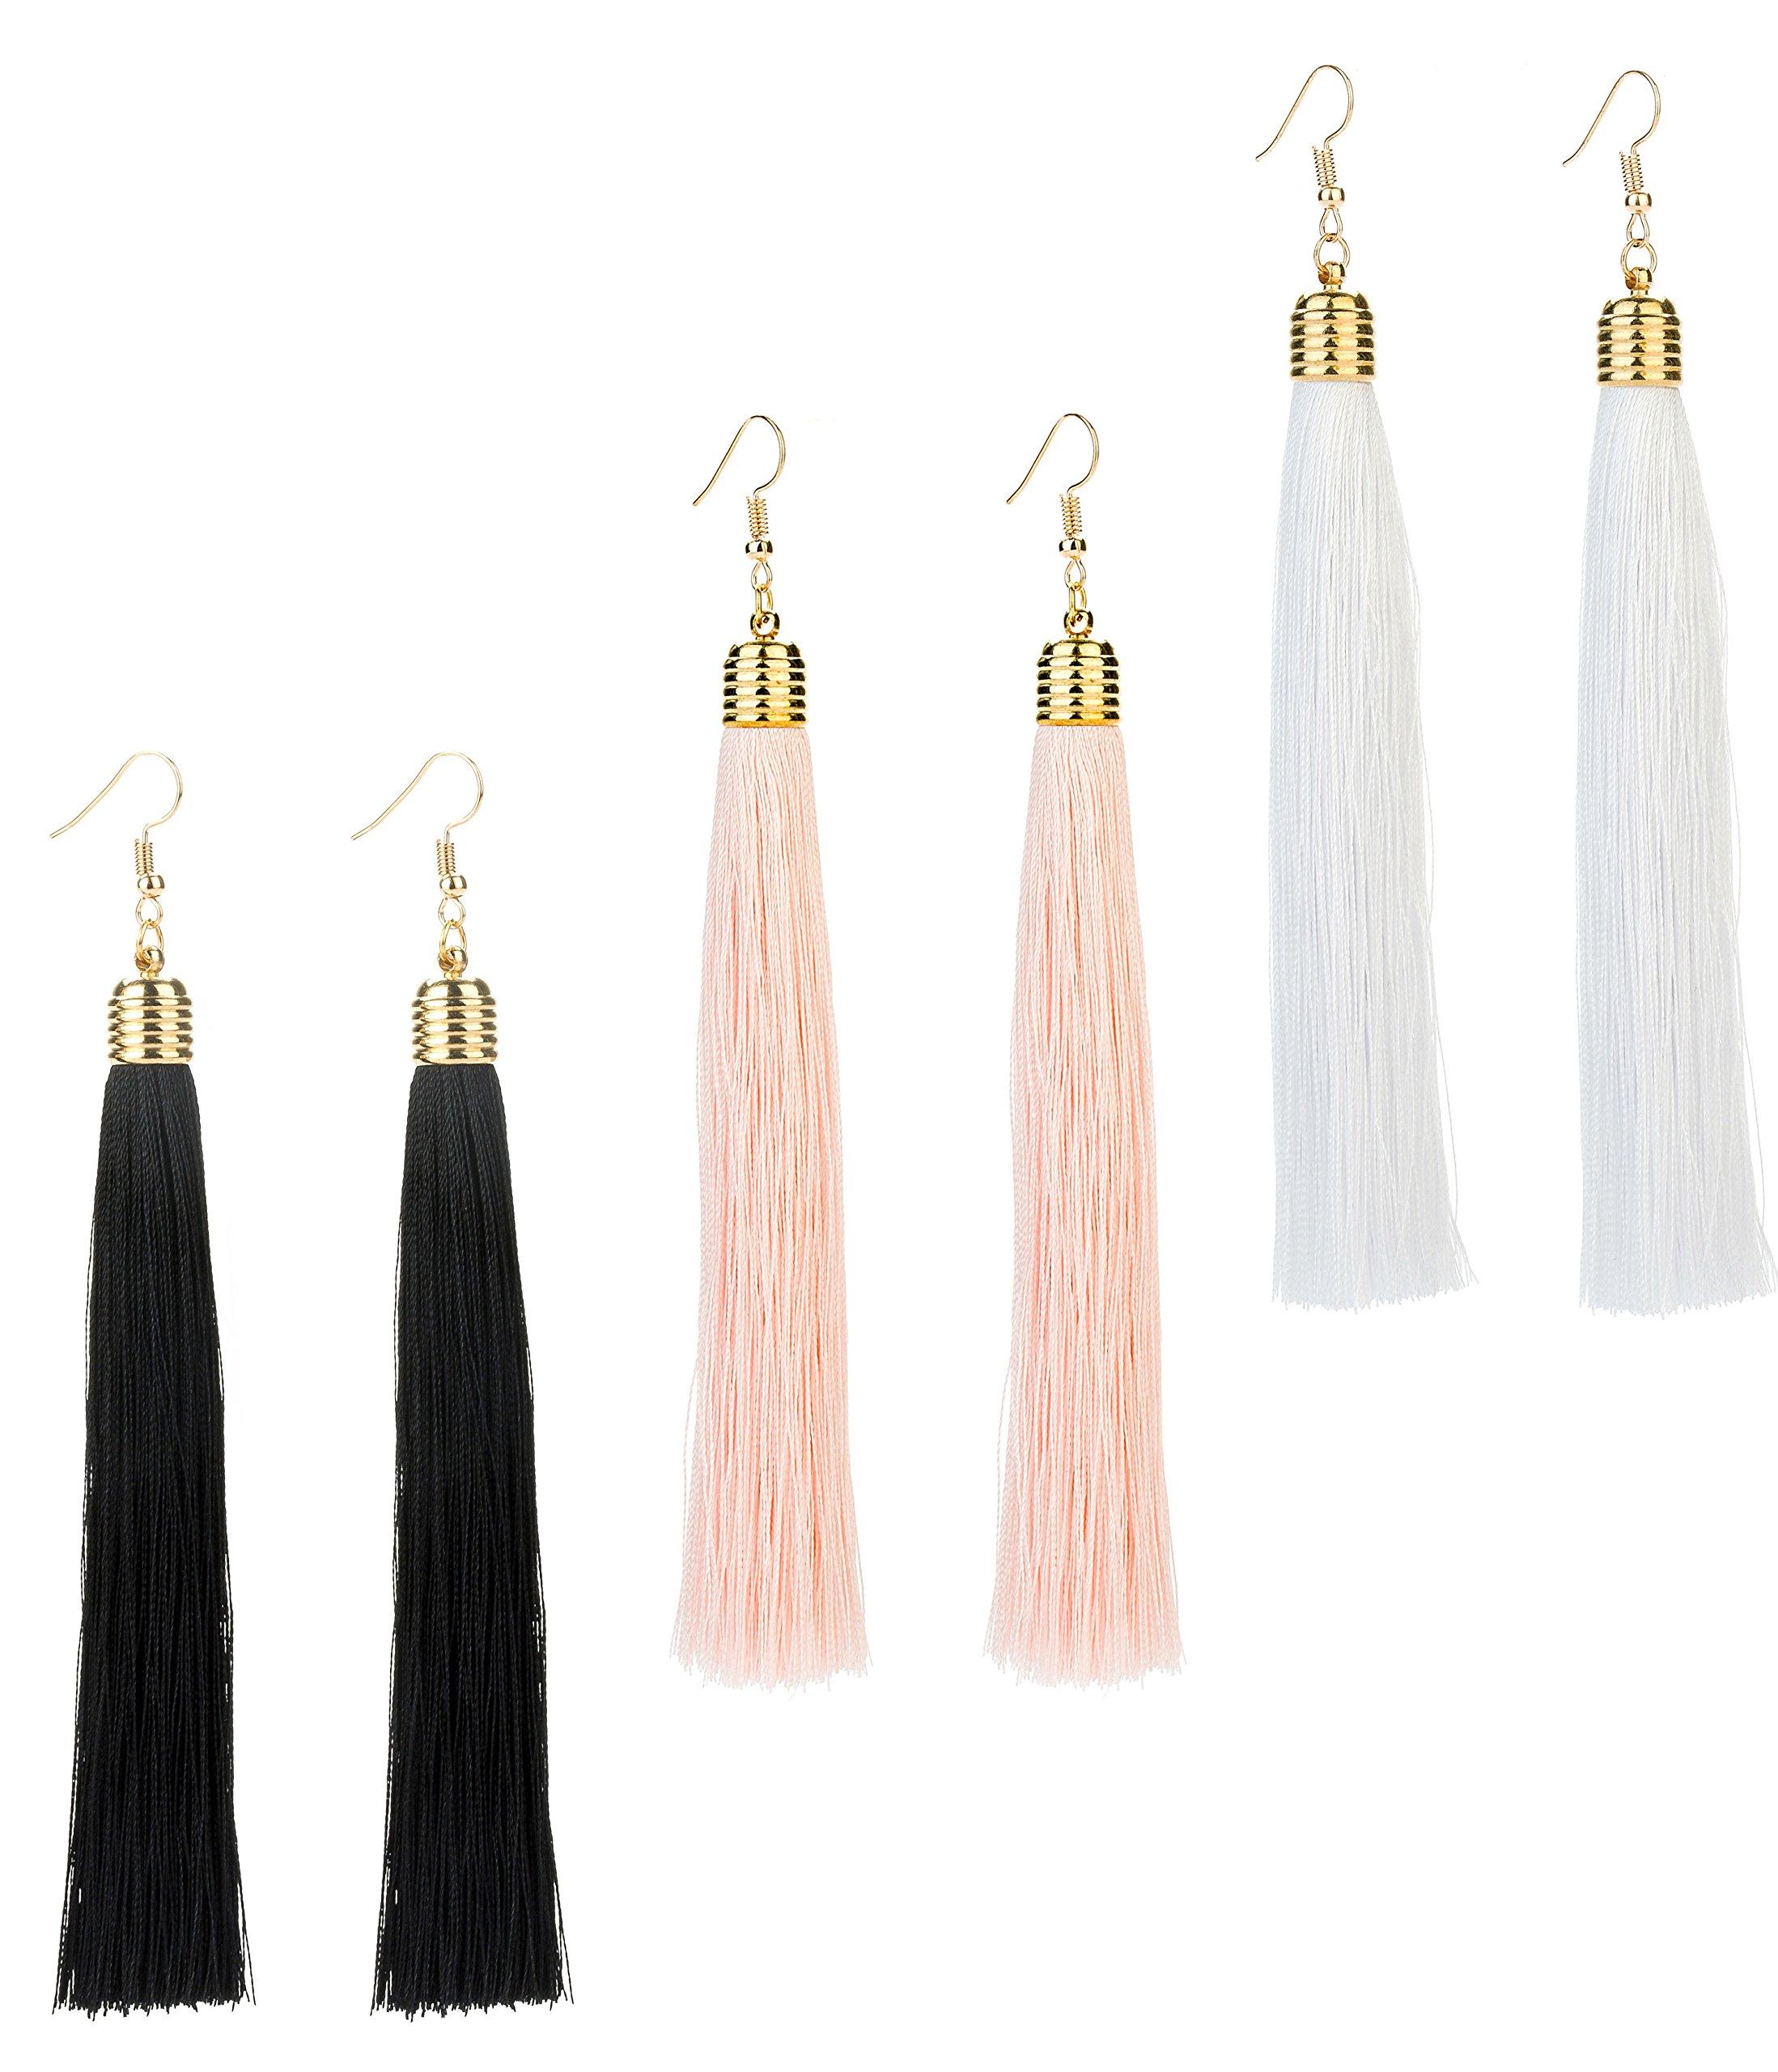 eac96ad18 REVOLIA 3 Pairs Womens Long Tassel Dangle Earrings for Girls Fringe Drop  Earrings Elegant (C